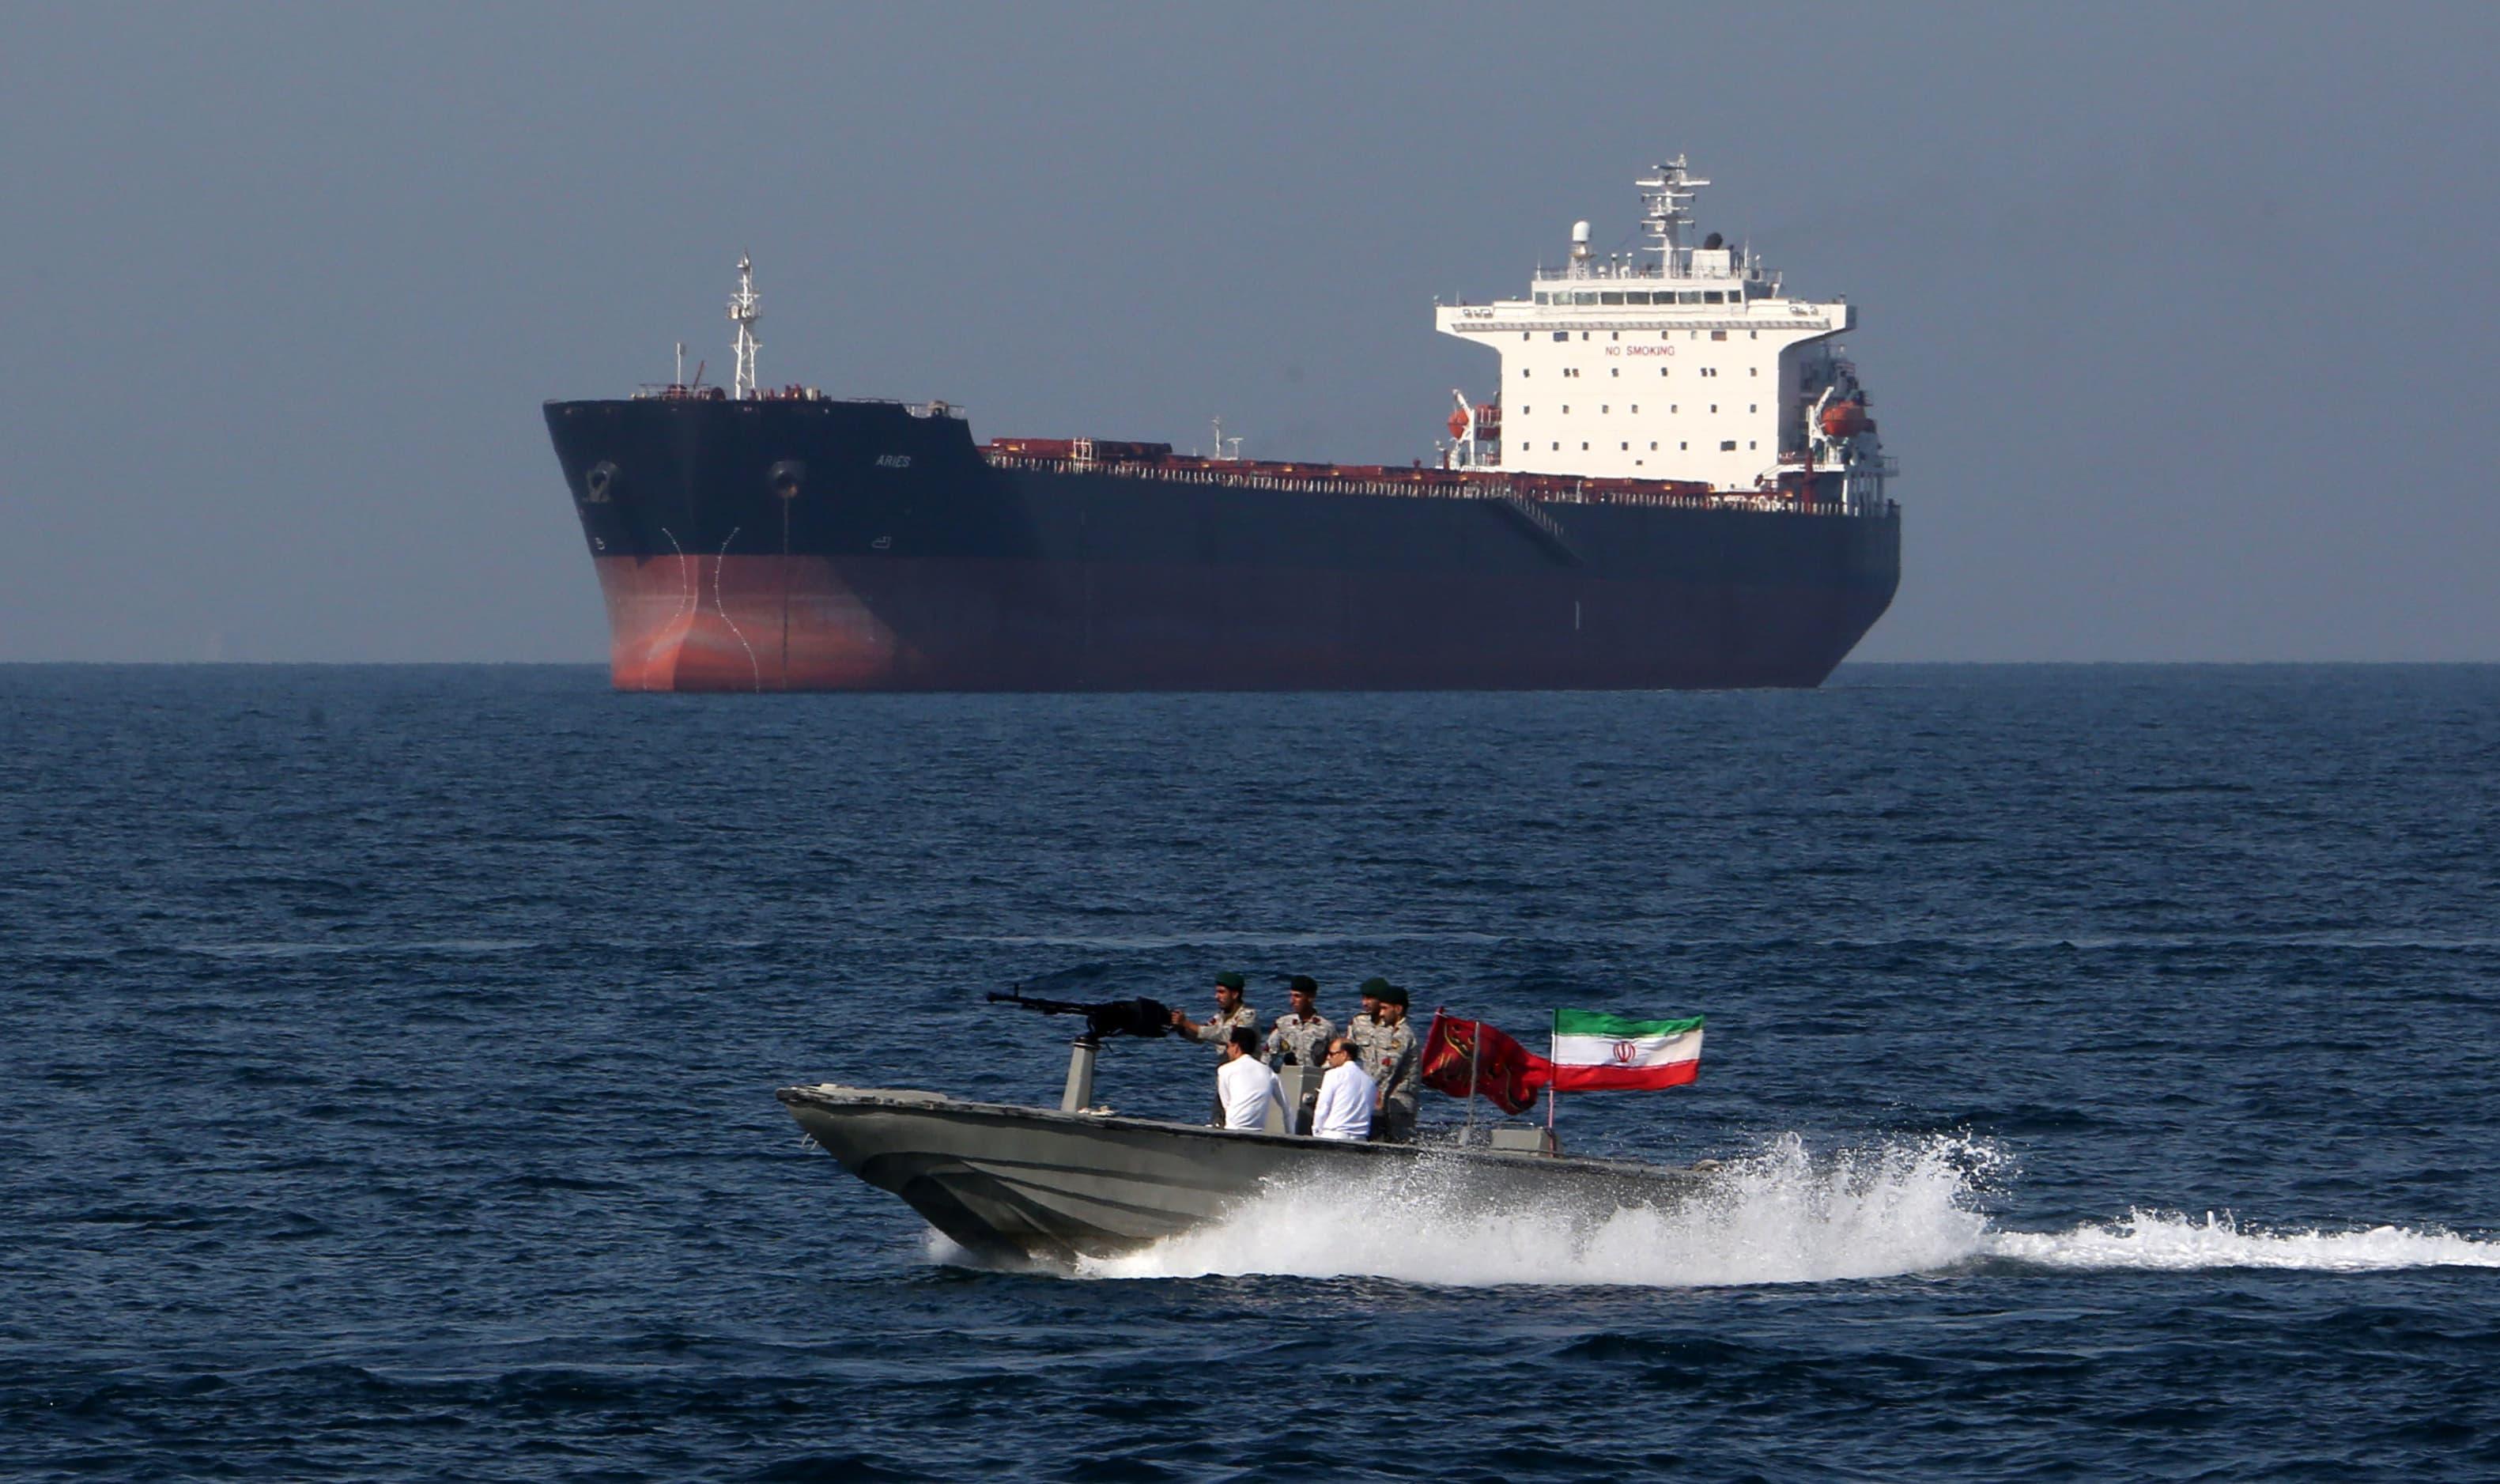 Oil: Insurance rates have soared since tanker attacks near Iran